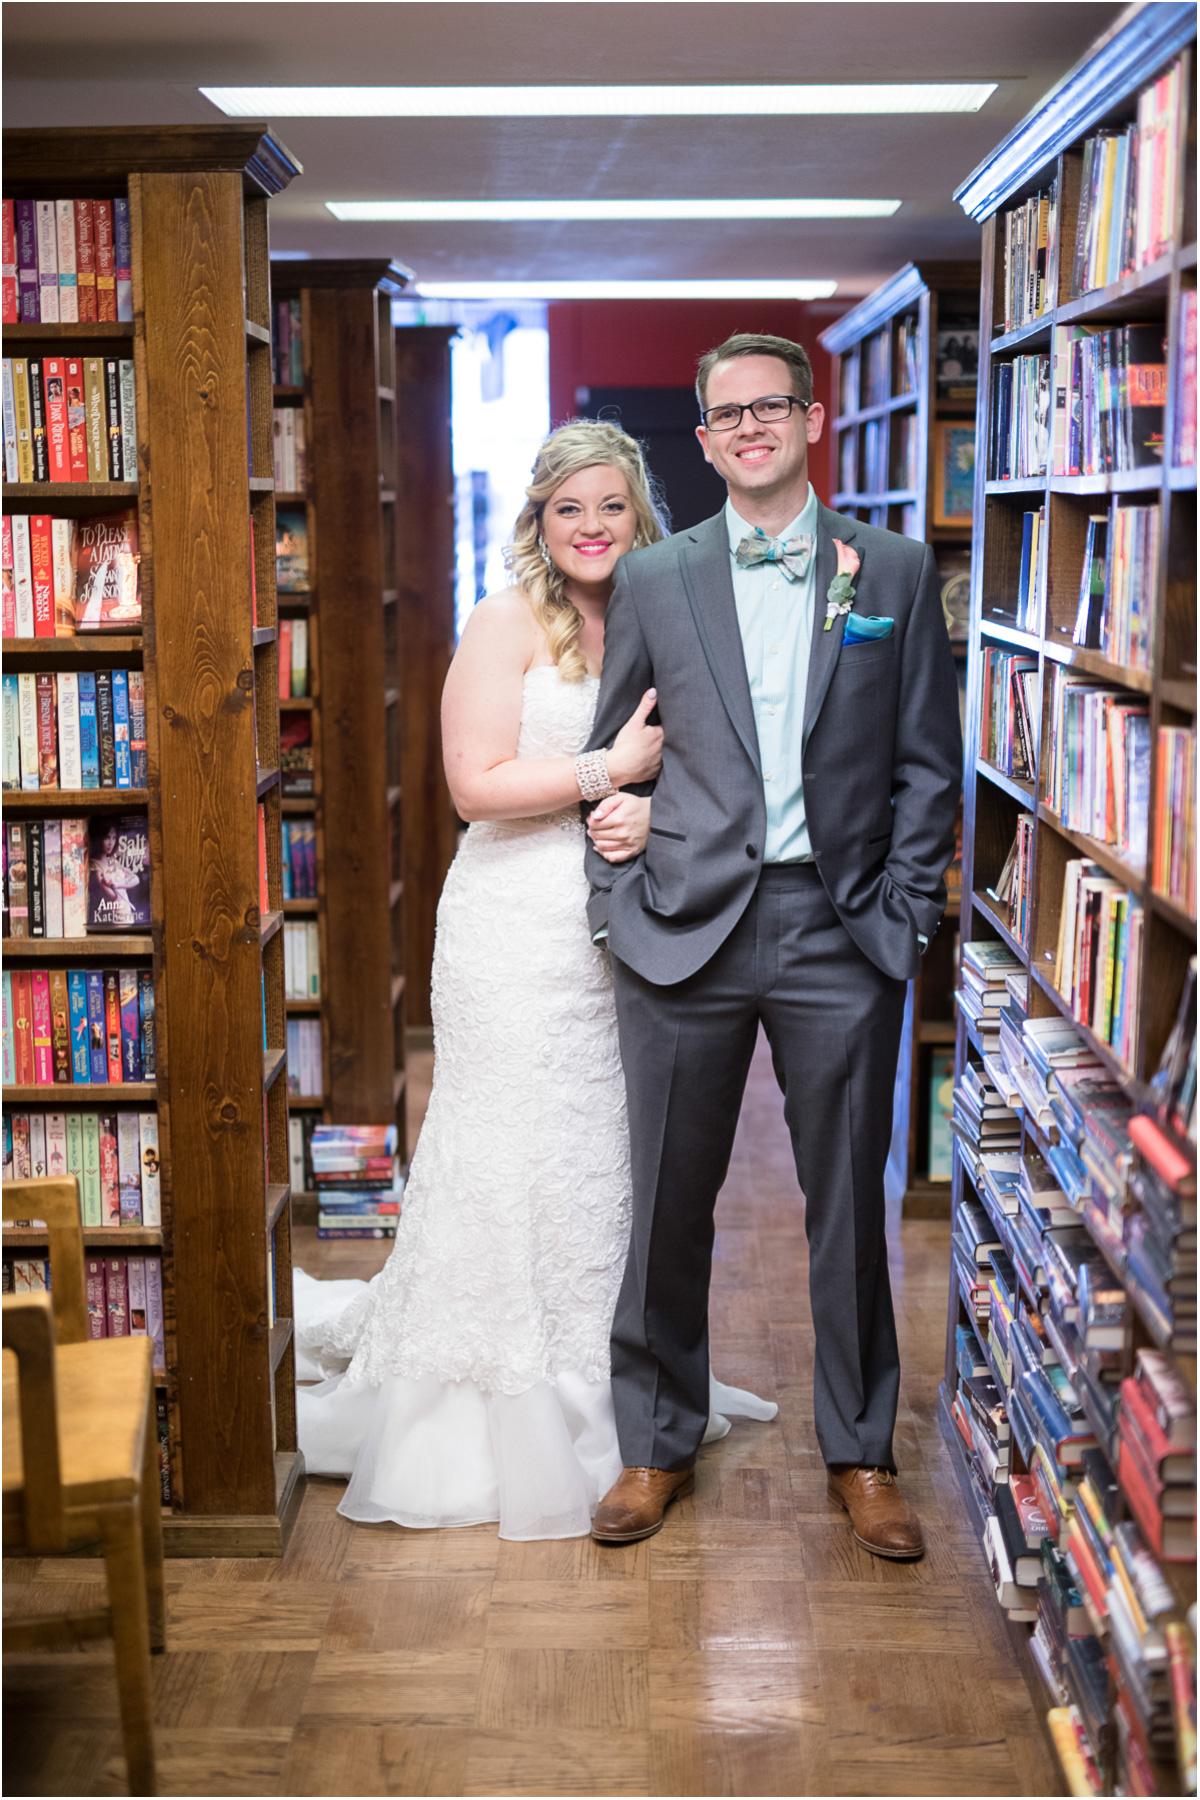 vintage wedding photos in bookstore dusty bookshelf manhattan kansas